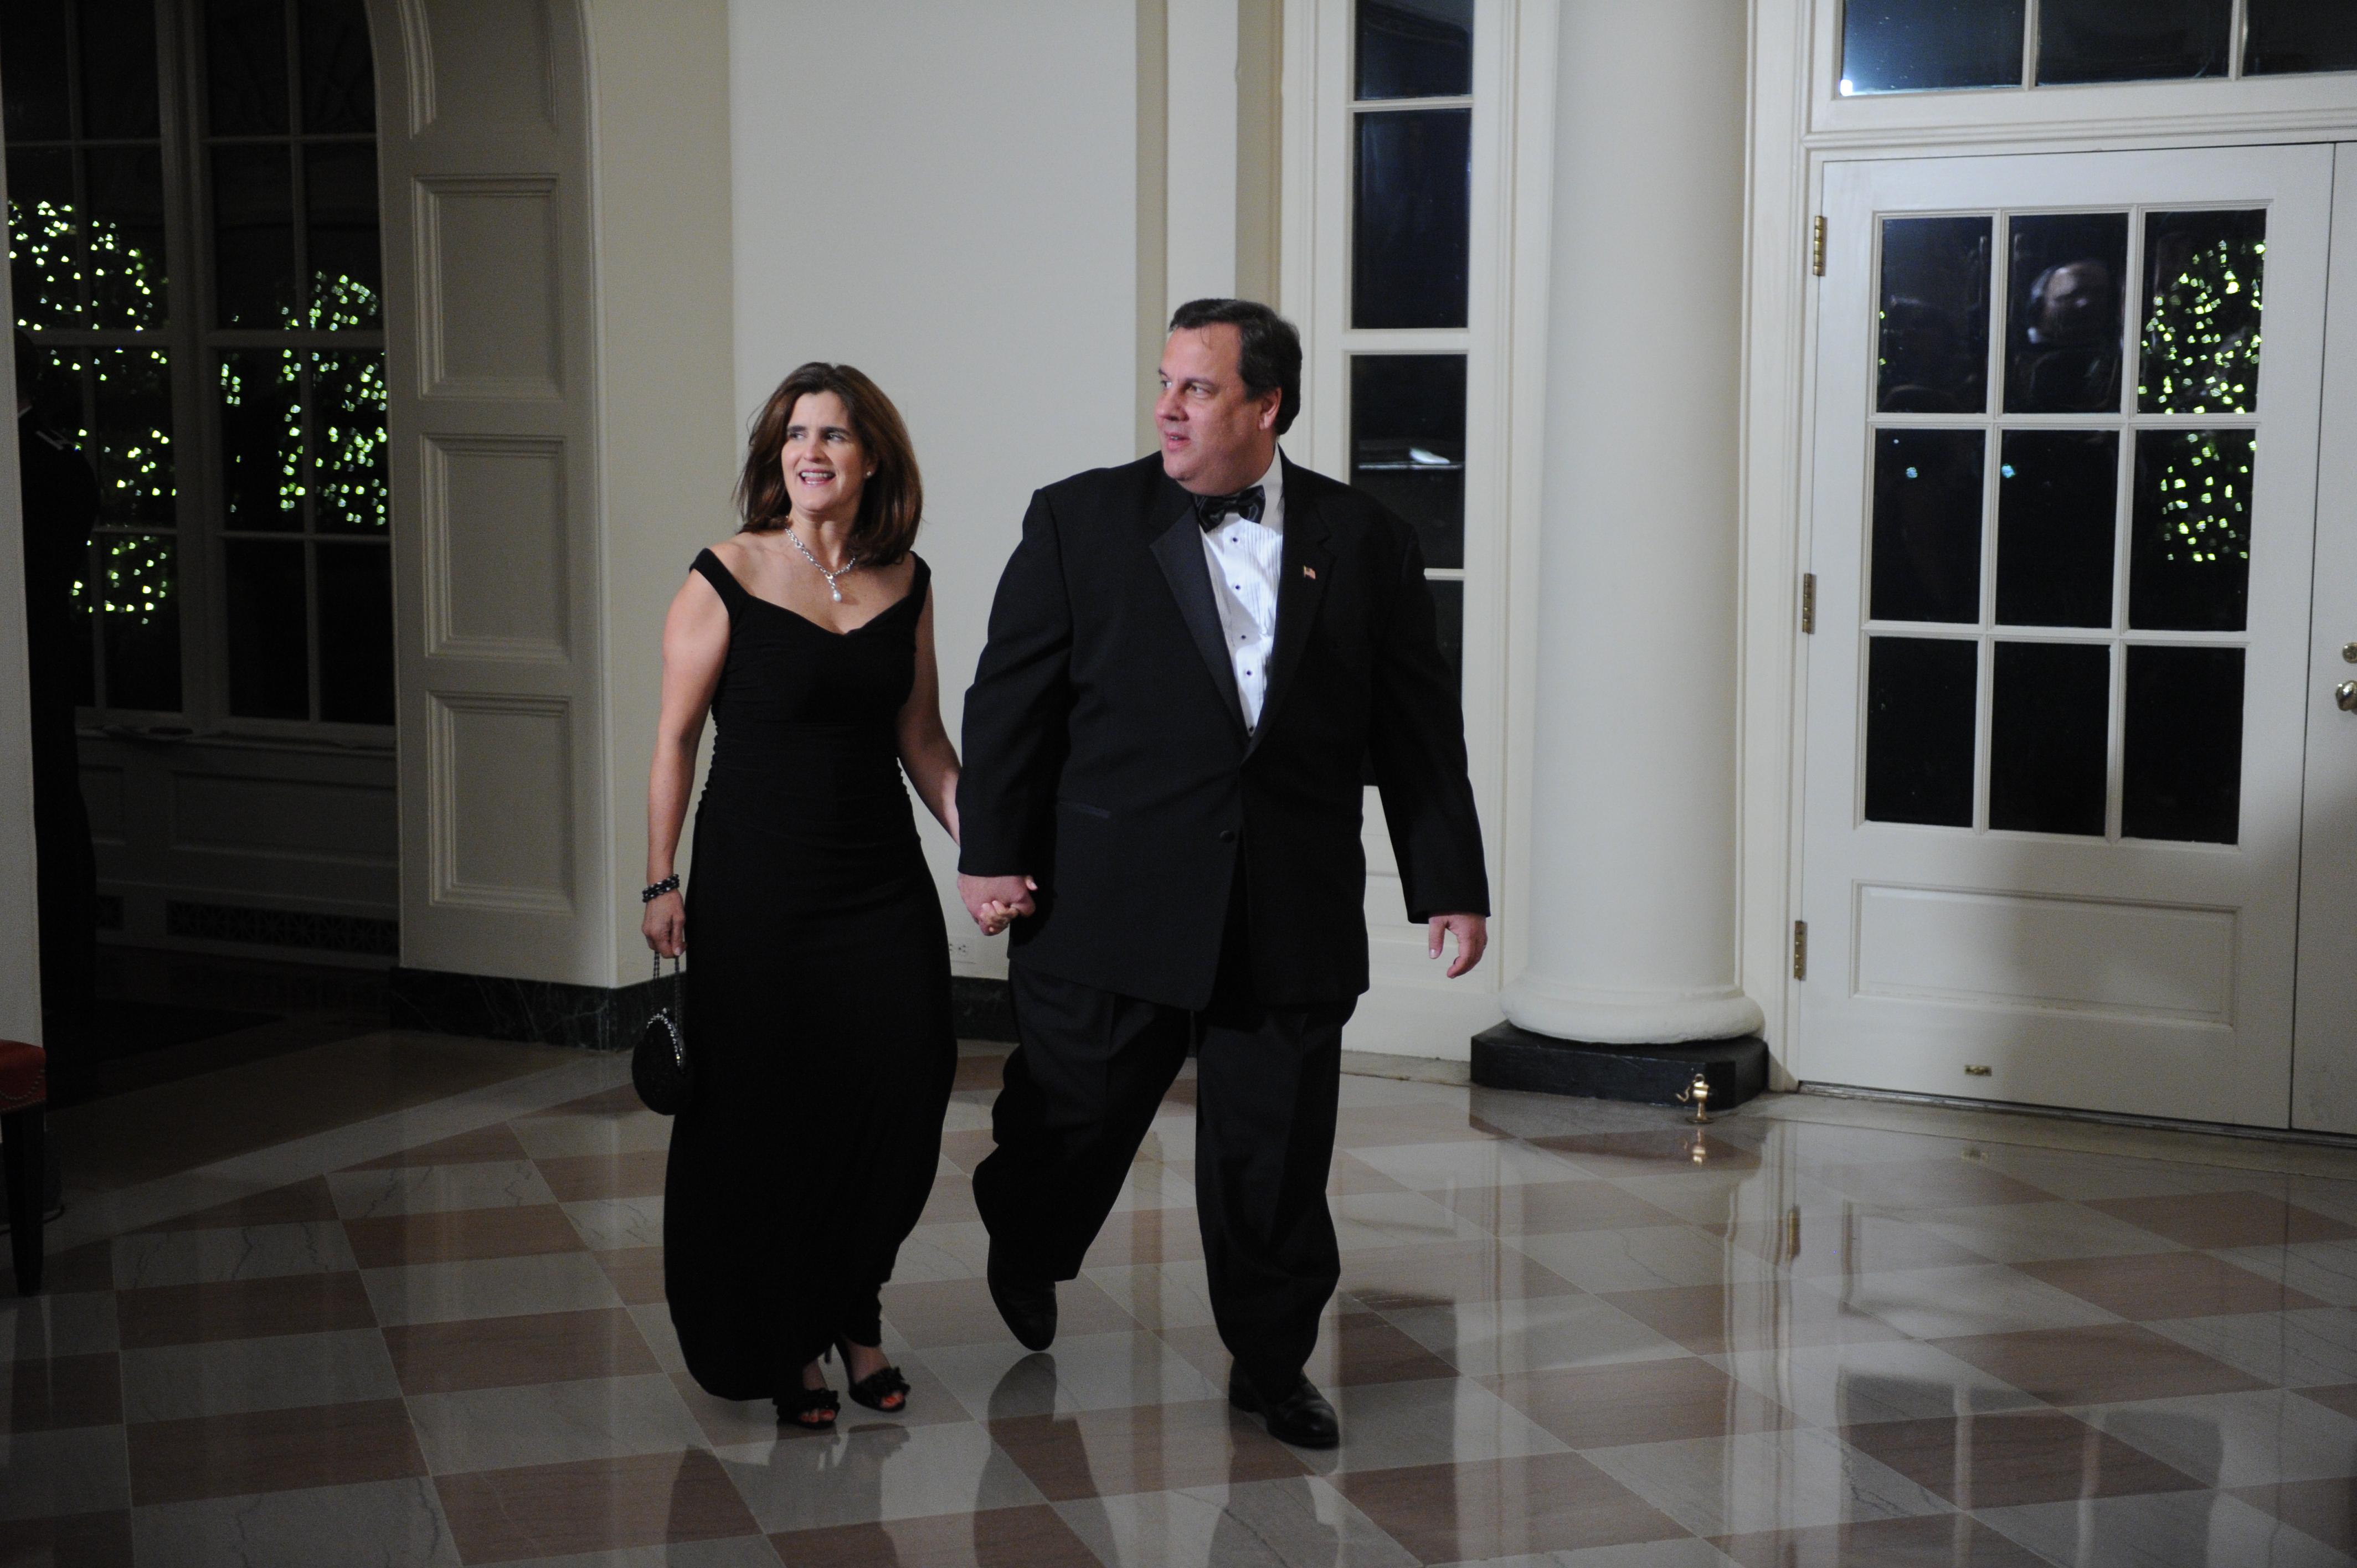 Chris Christie wife, Mary Pat Christie